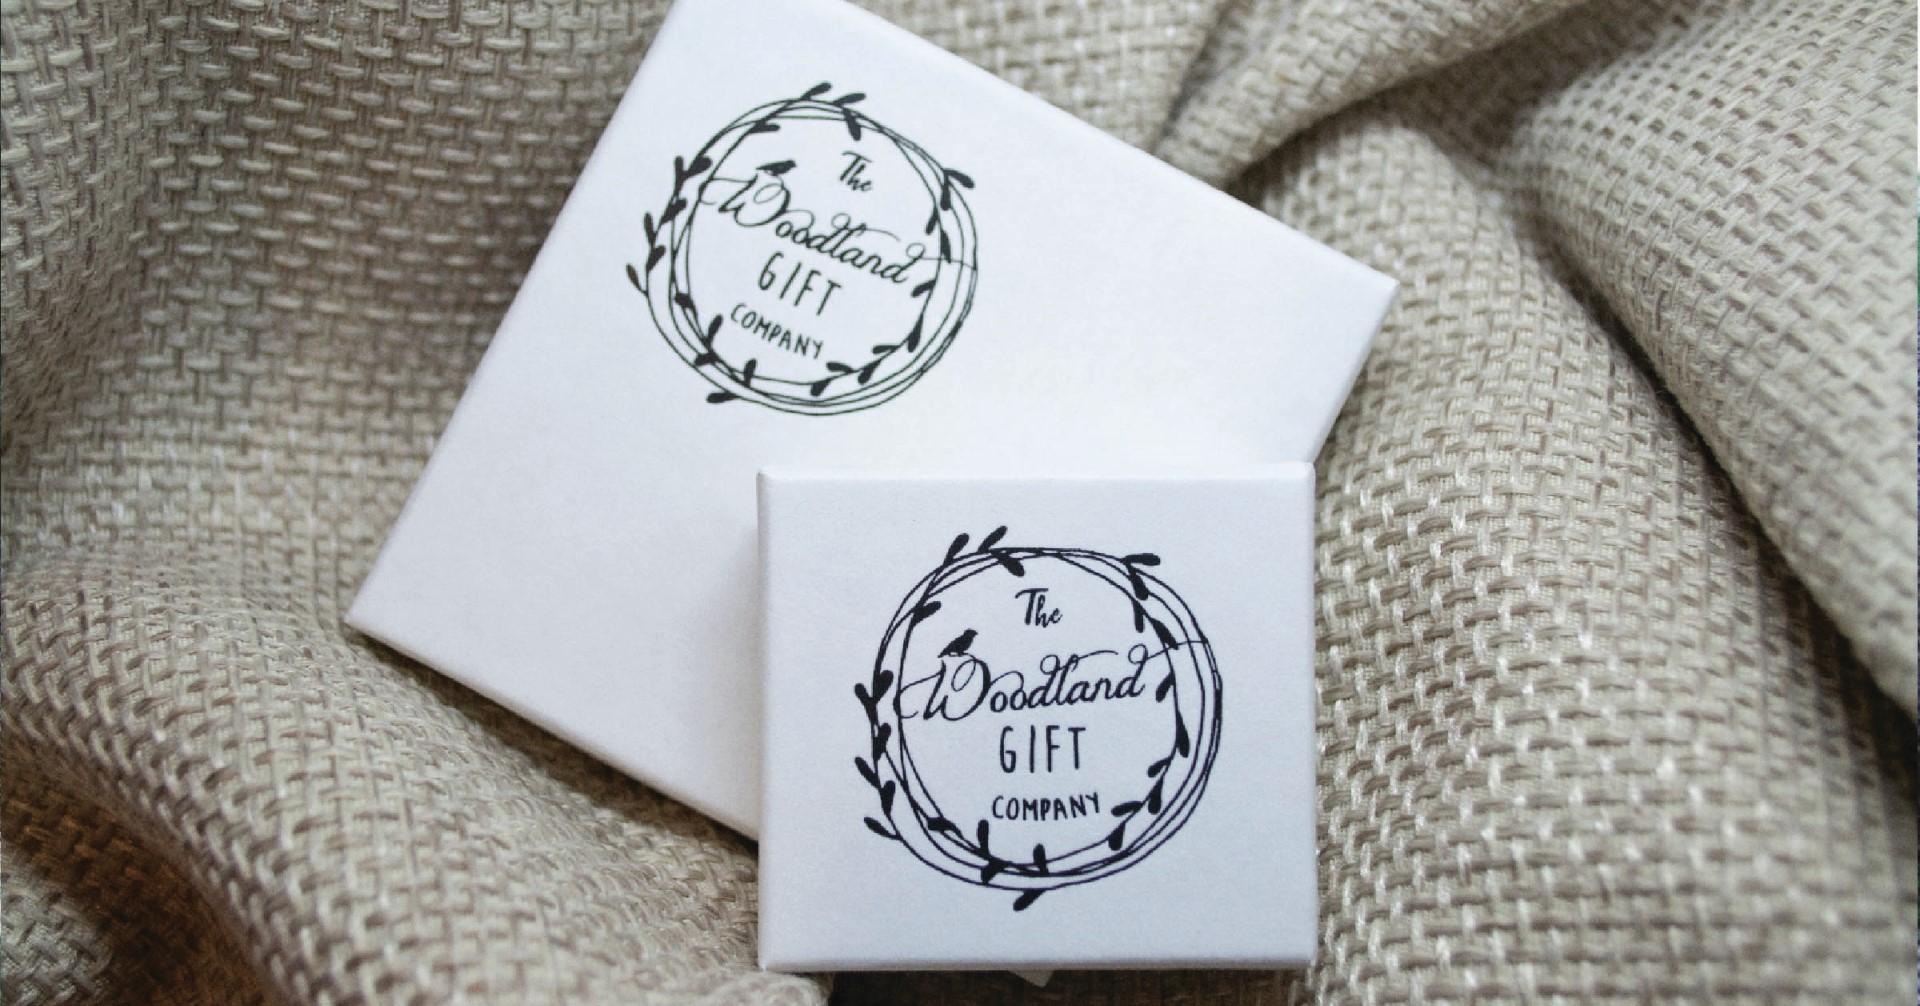 The Woodland Gift Company UK Made Cardboard Box